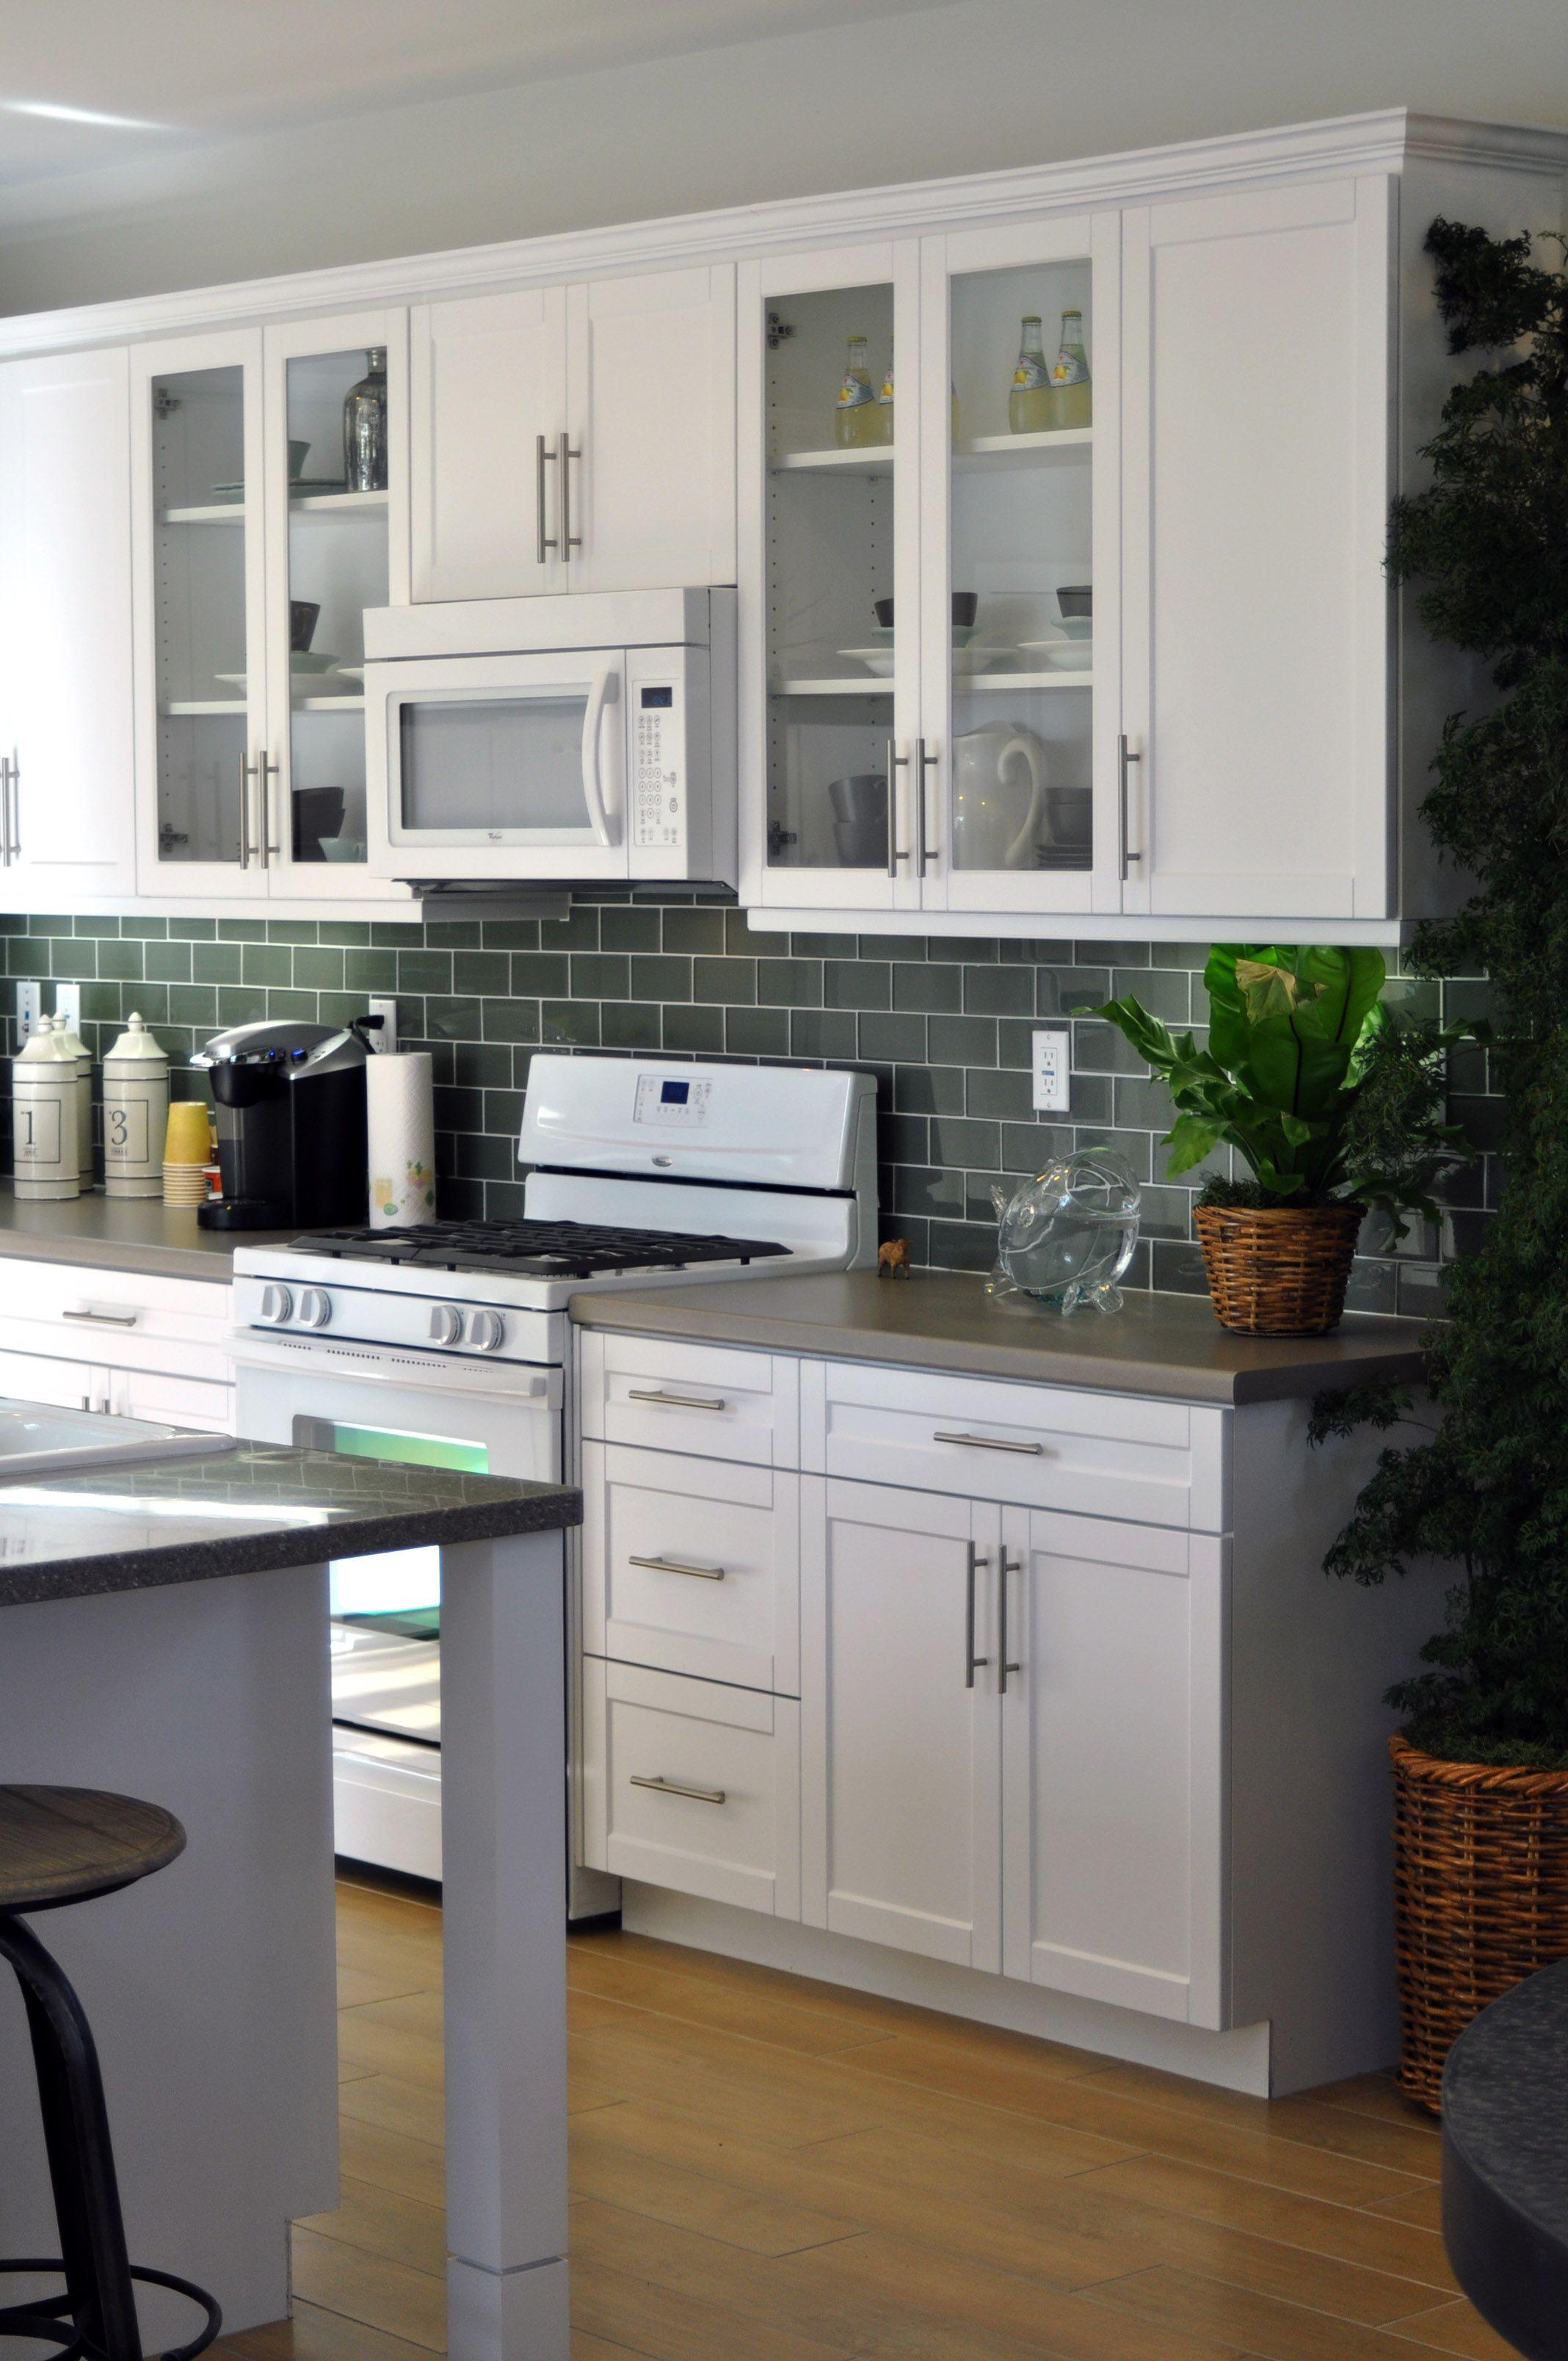 white shaker kitchen | Shaker Style Cabinets For Kitchen Design: Cool White Wooden Kitchen ...